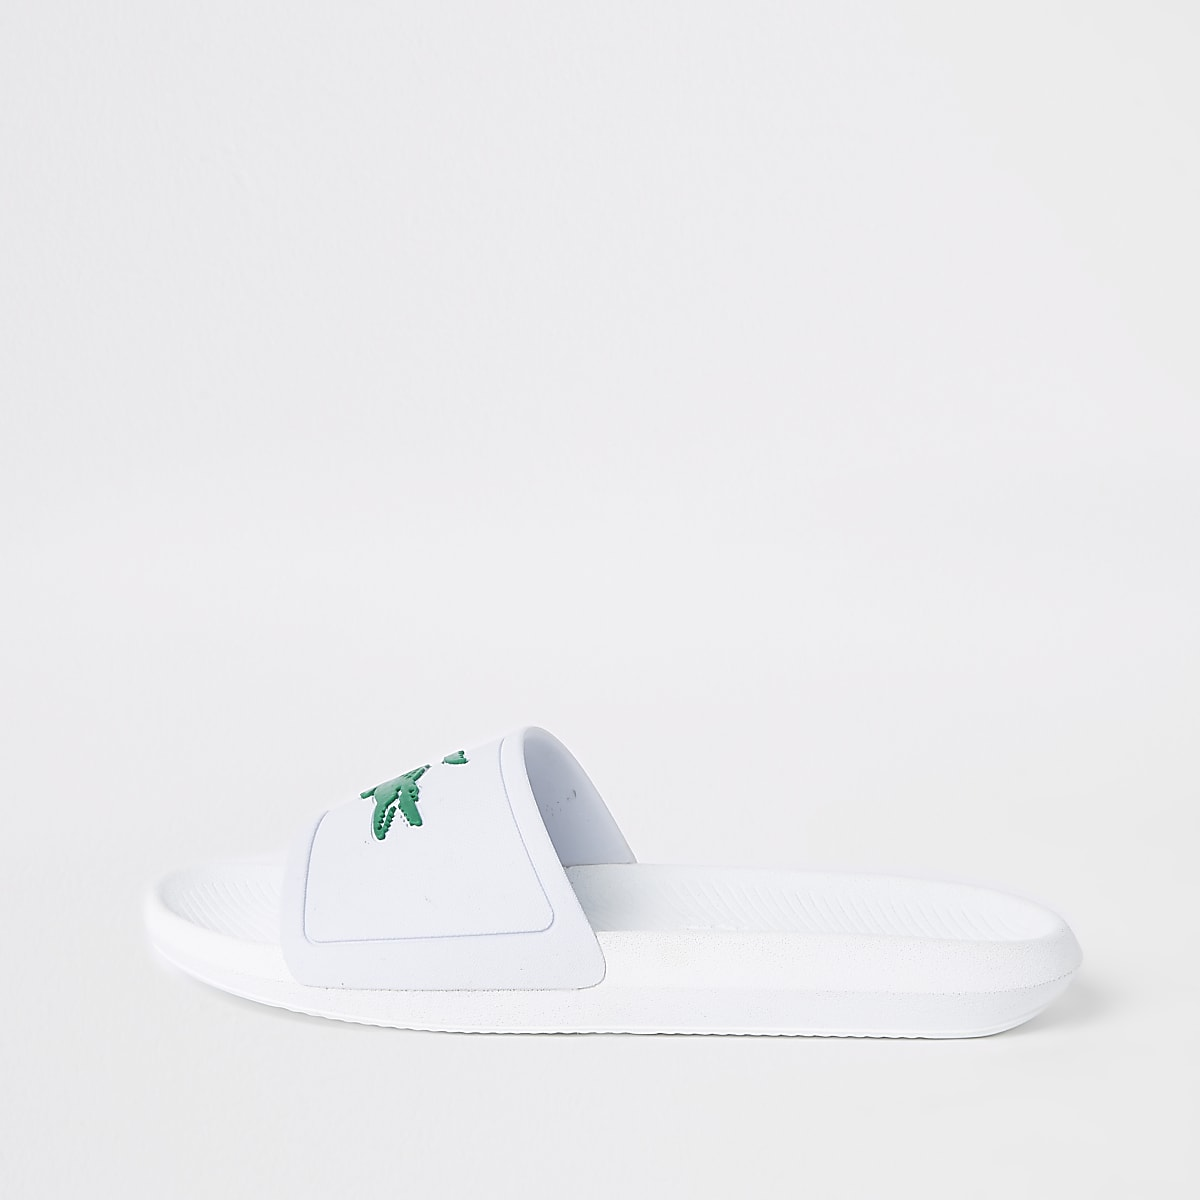 Lacoste - Witte slippers met reliëf